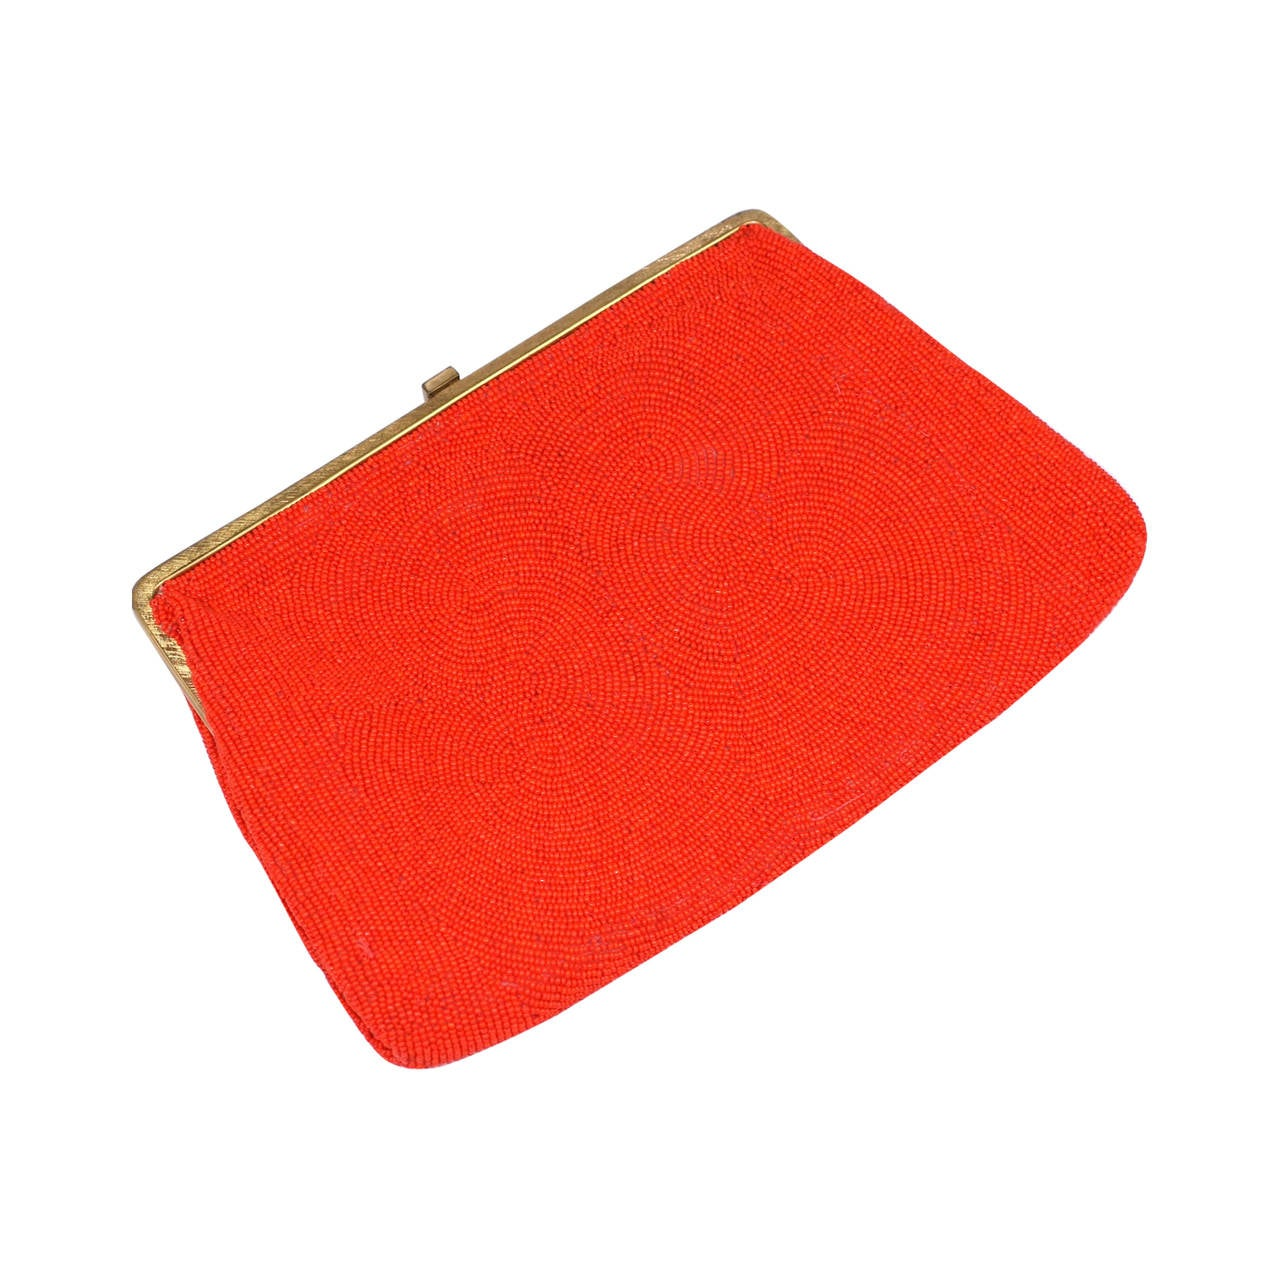 Vivid Orange Beaded Bag, Walborg